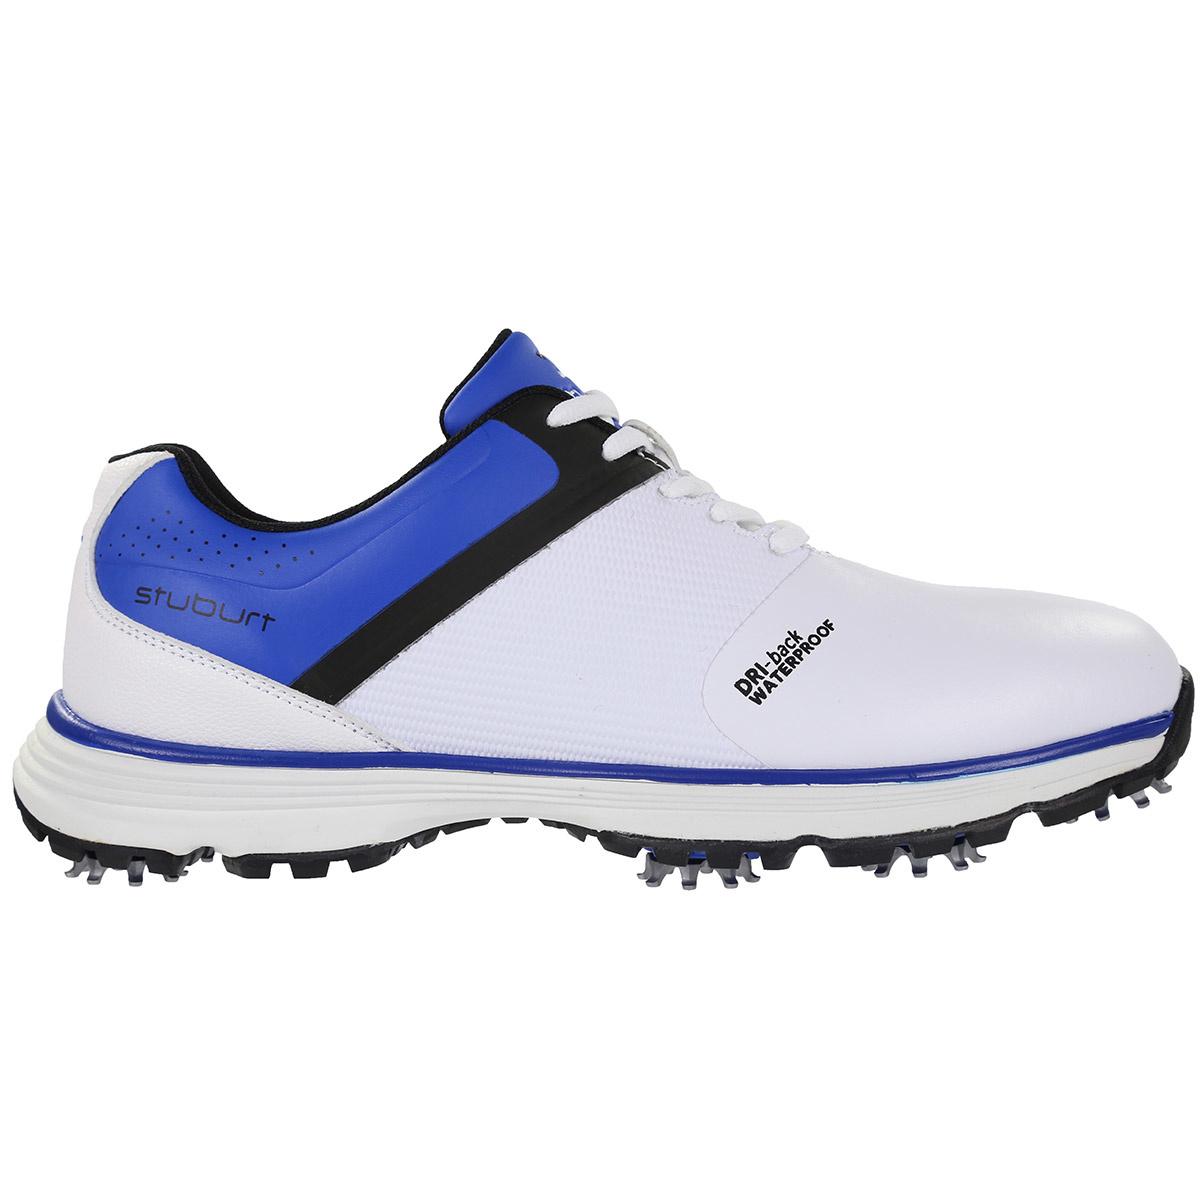 Stuburt PCT - sport heren golf schoenen - Wit/Blauw